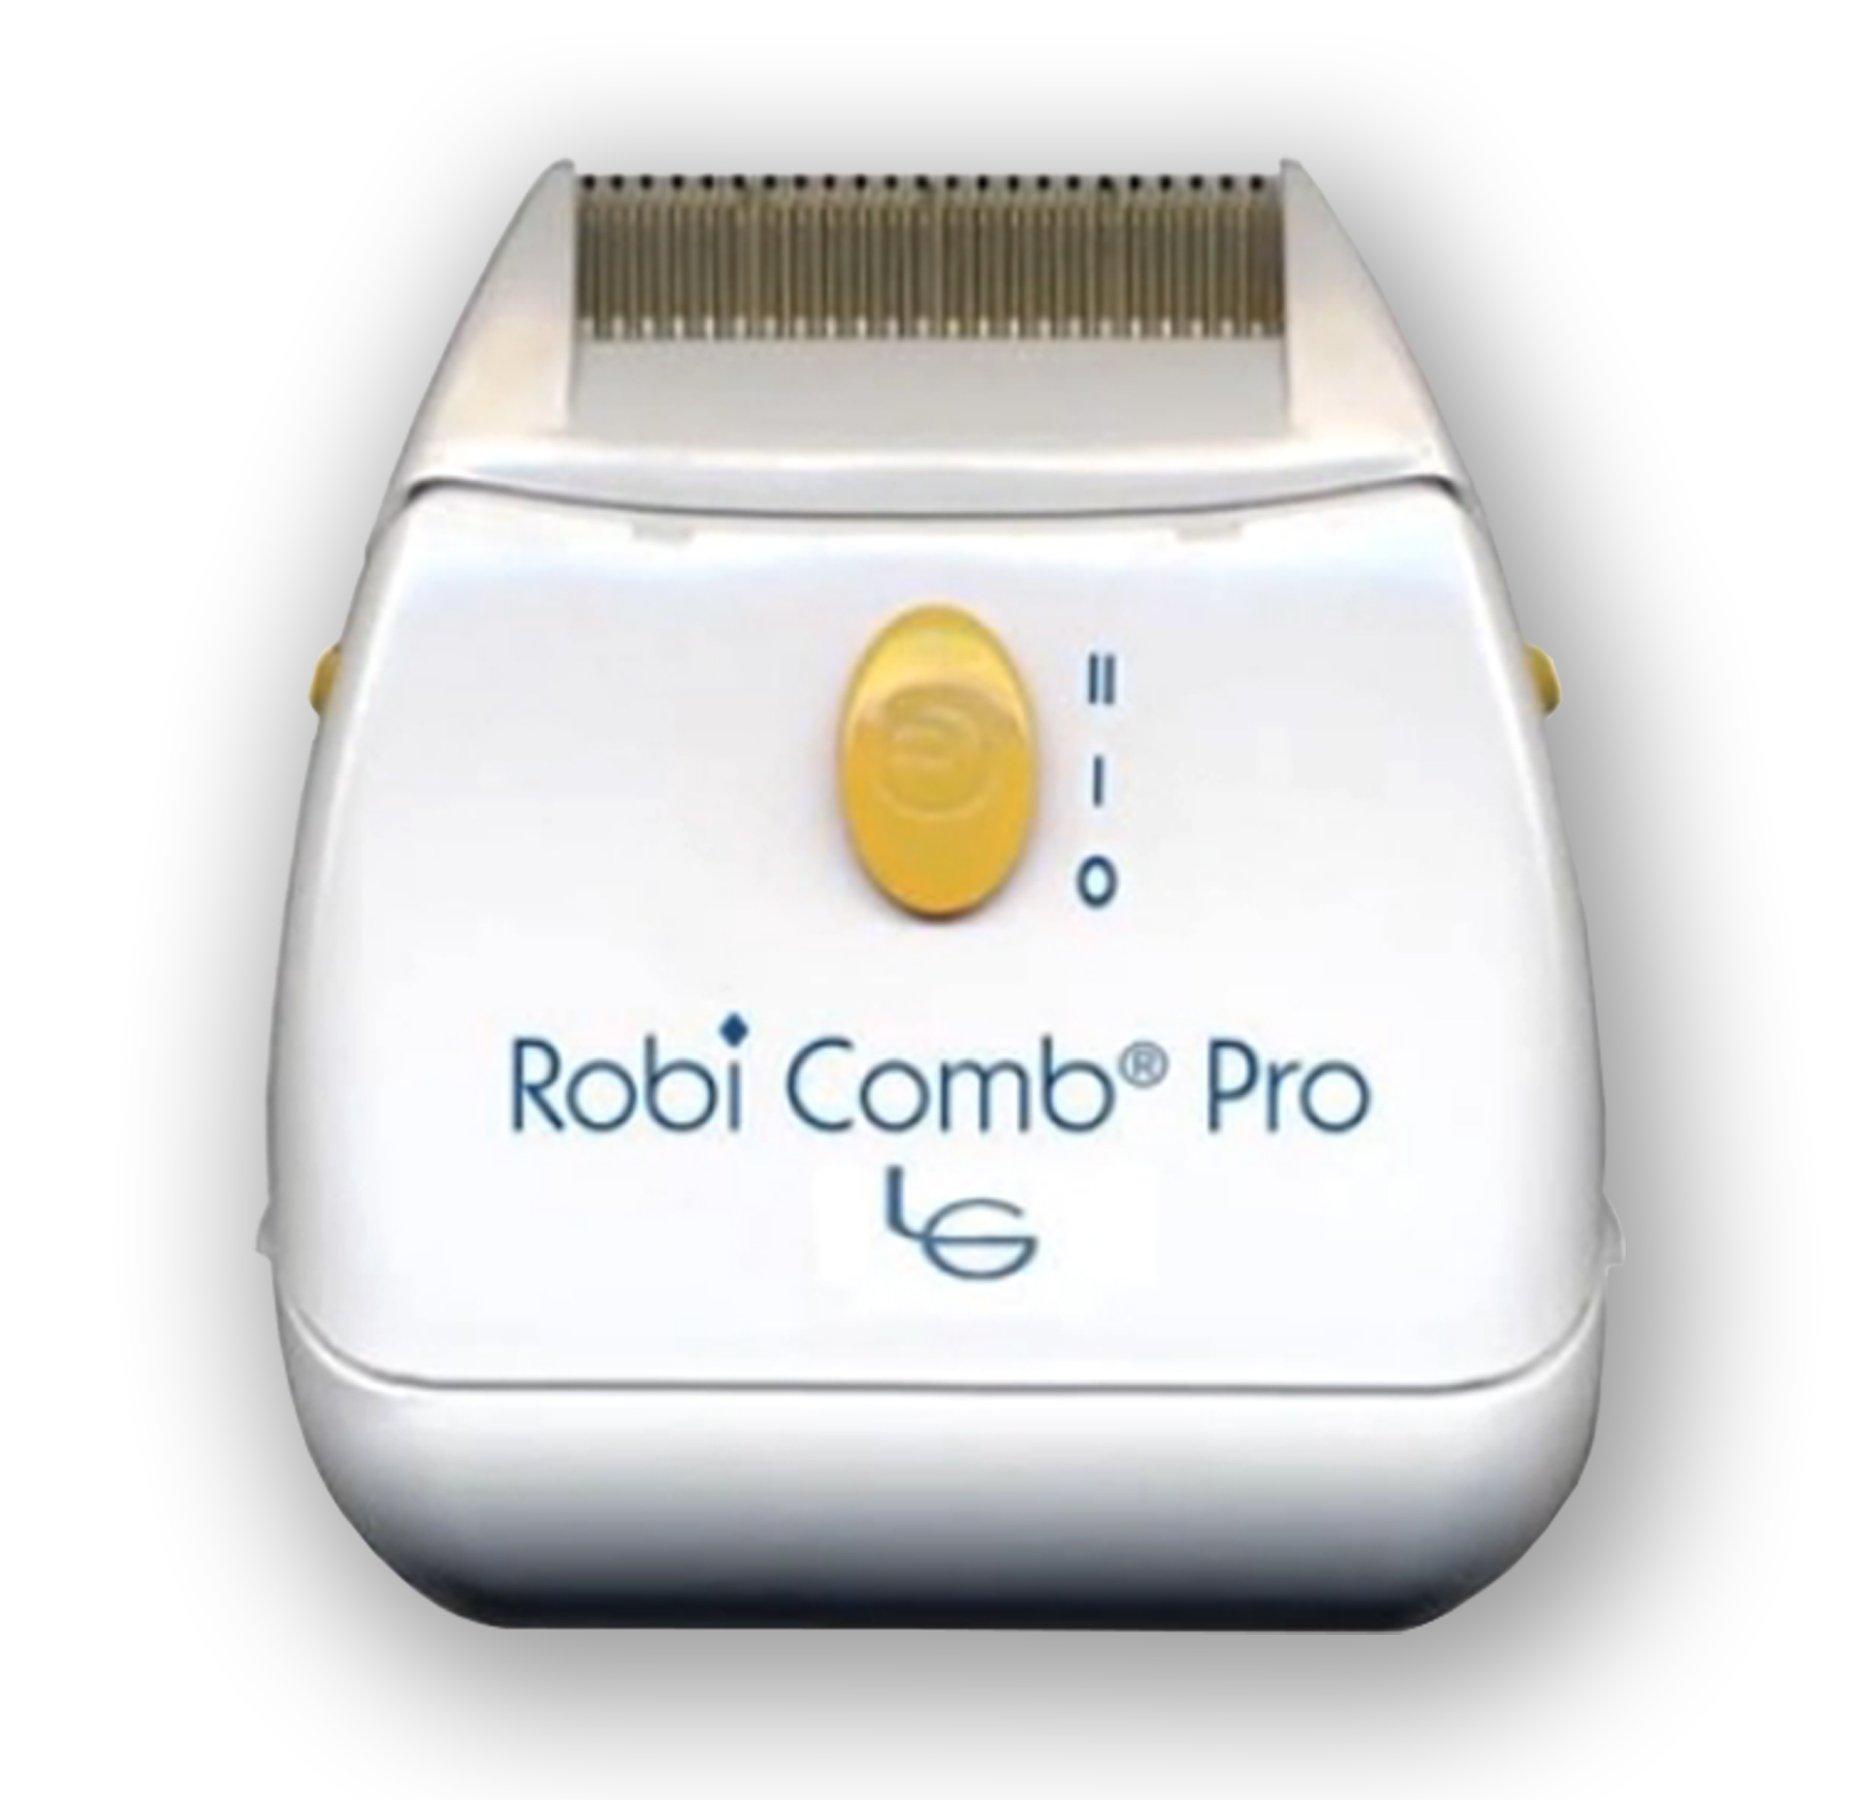 LiceGuard Robi Comb Pro - Electronic Lice Comb